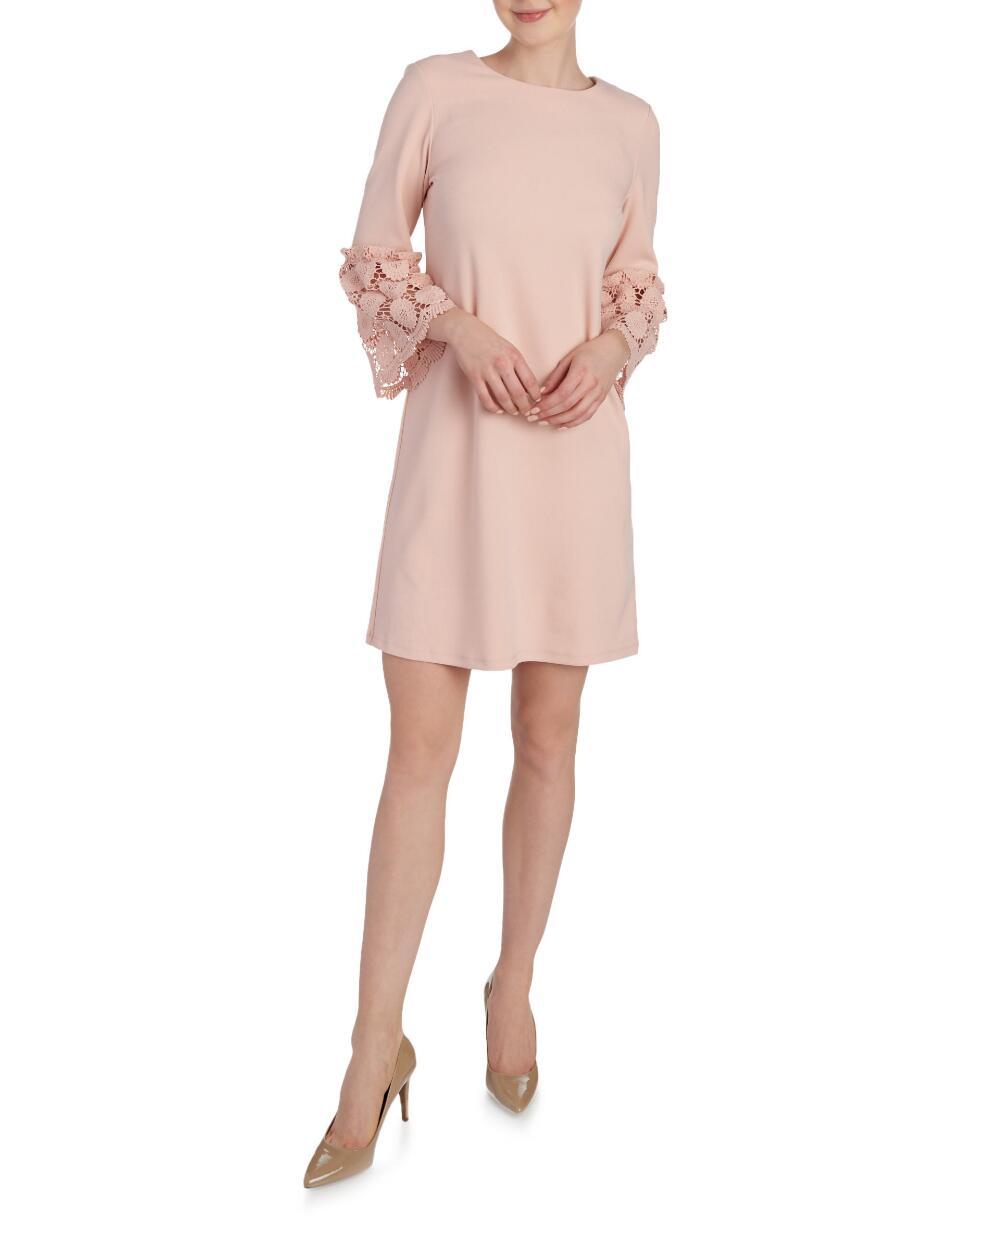 RONNI NICOLE Crochet Bell Sleeve Knit Shift Dress | Hermosaz